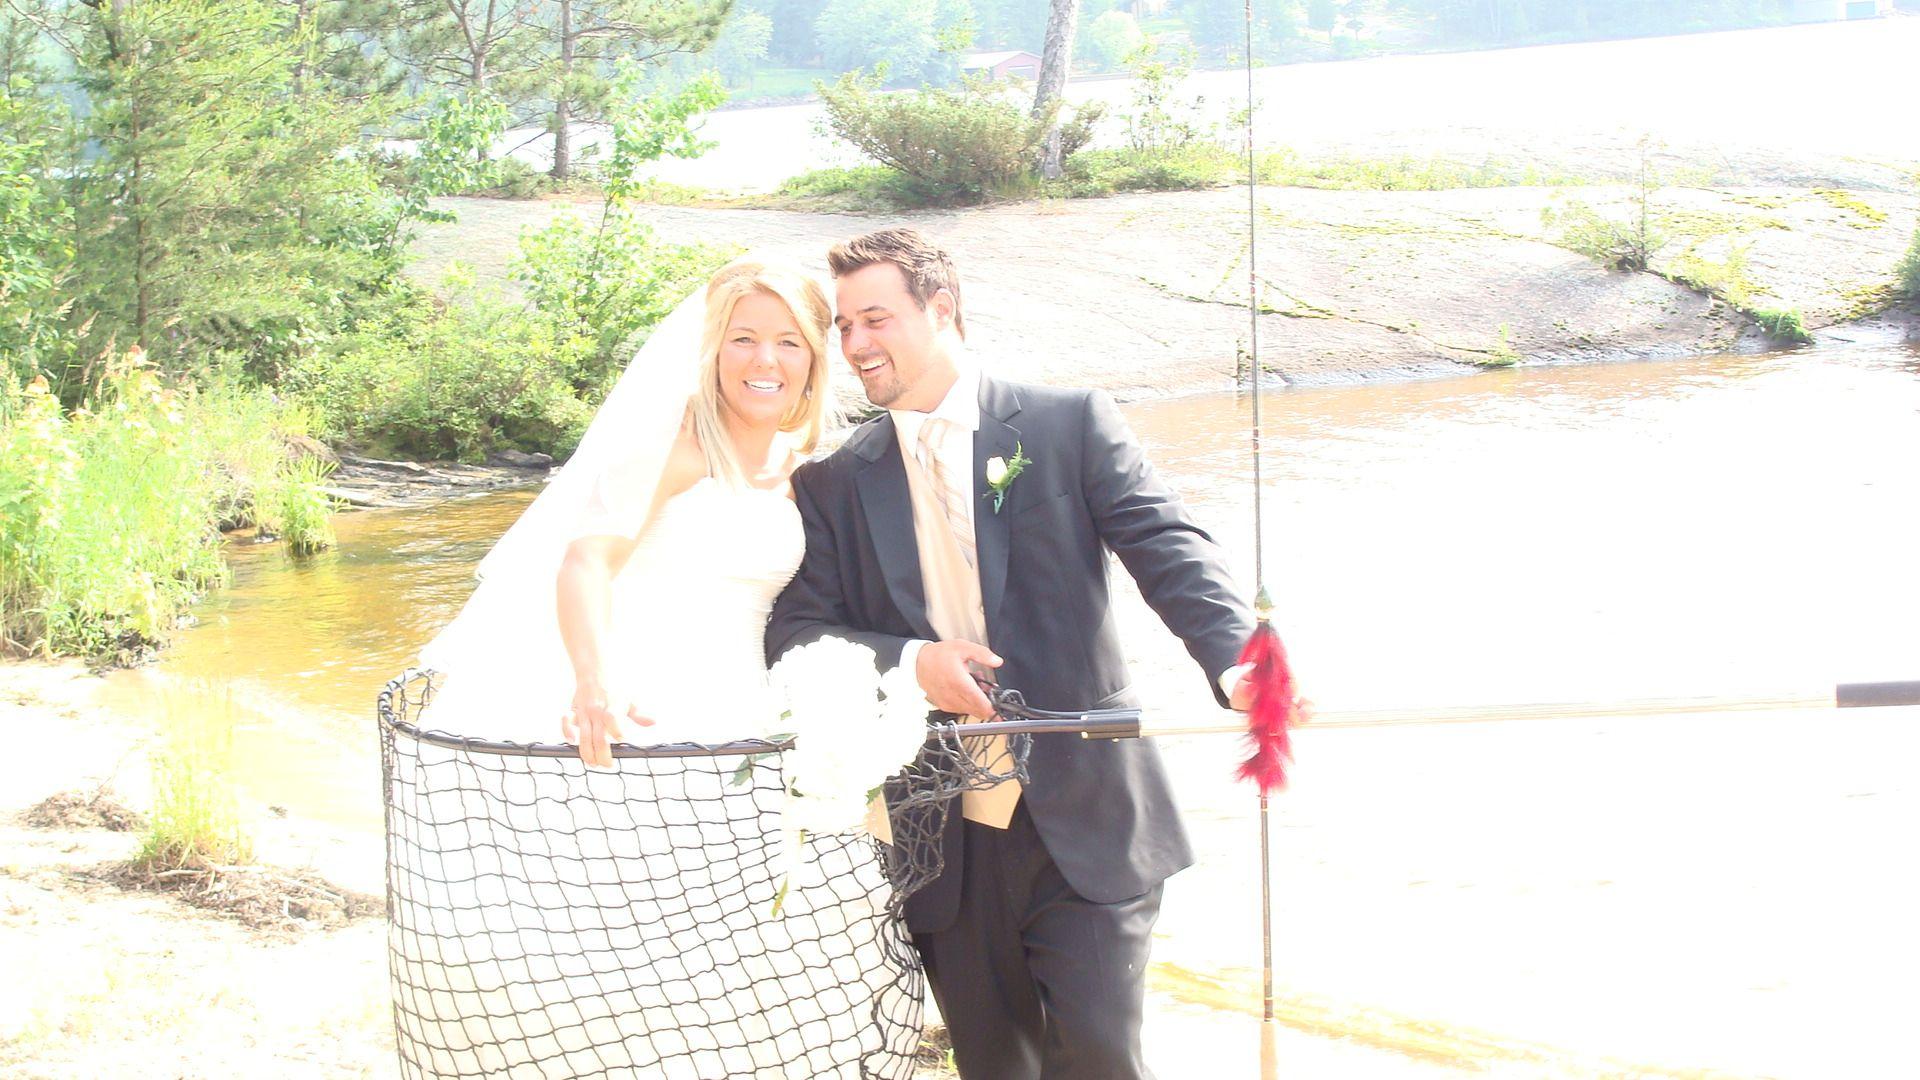 big catch | Fishing Themed Wedding Ideas | Pinterest | Fish wedding